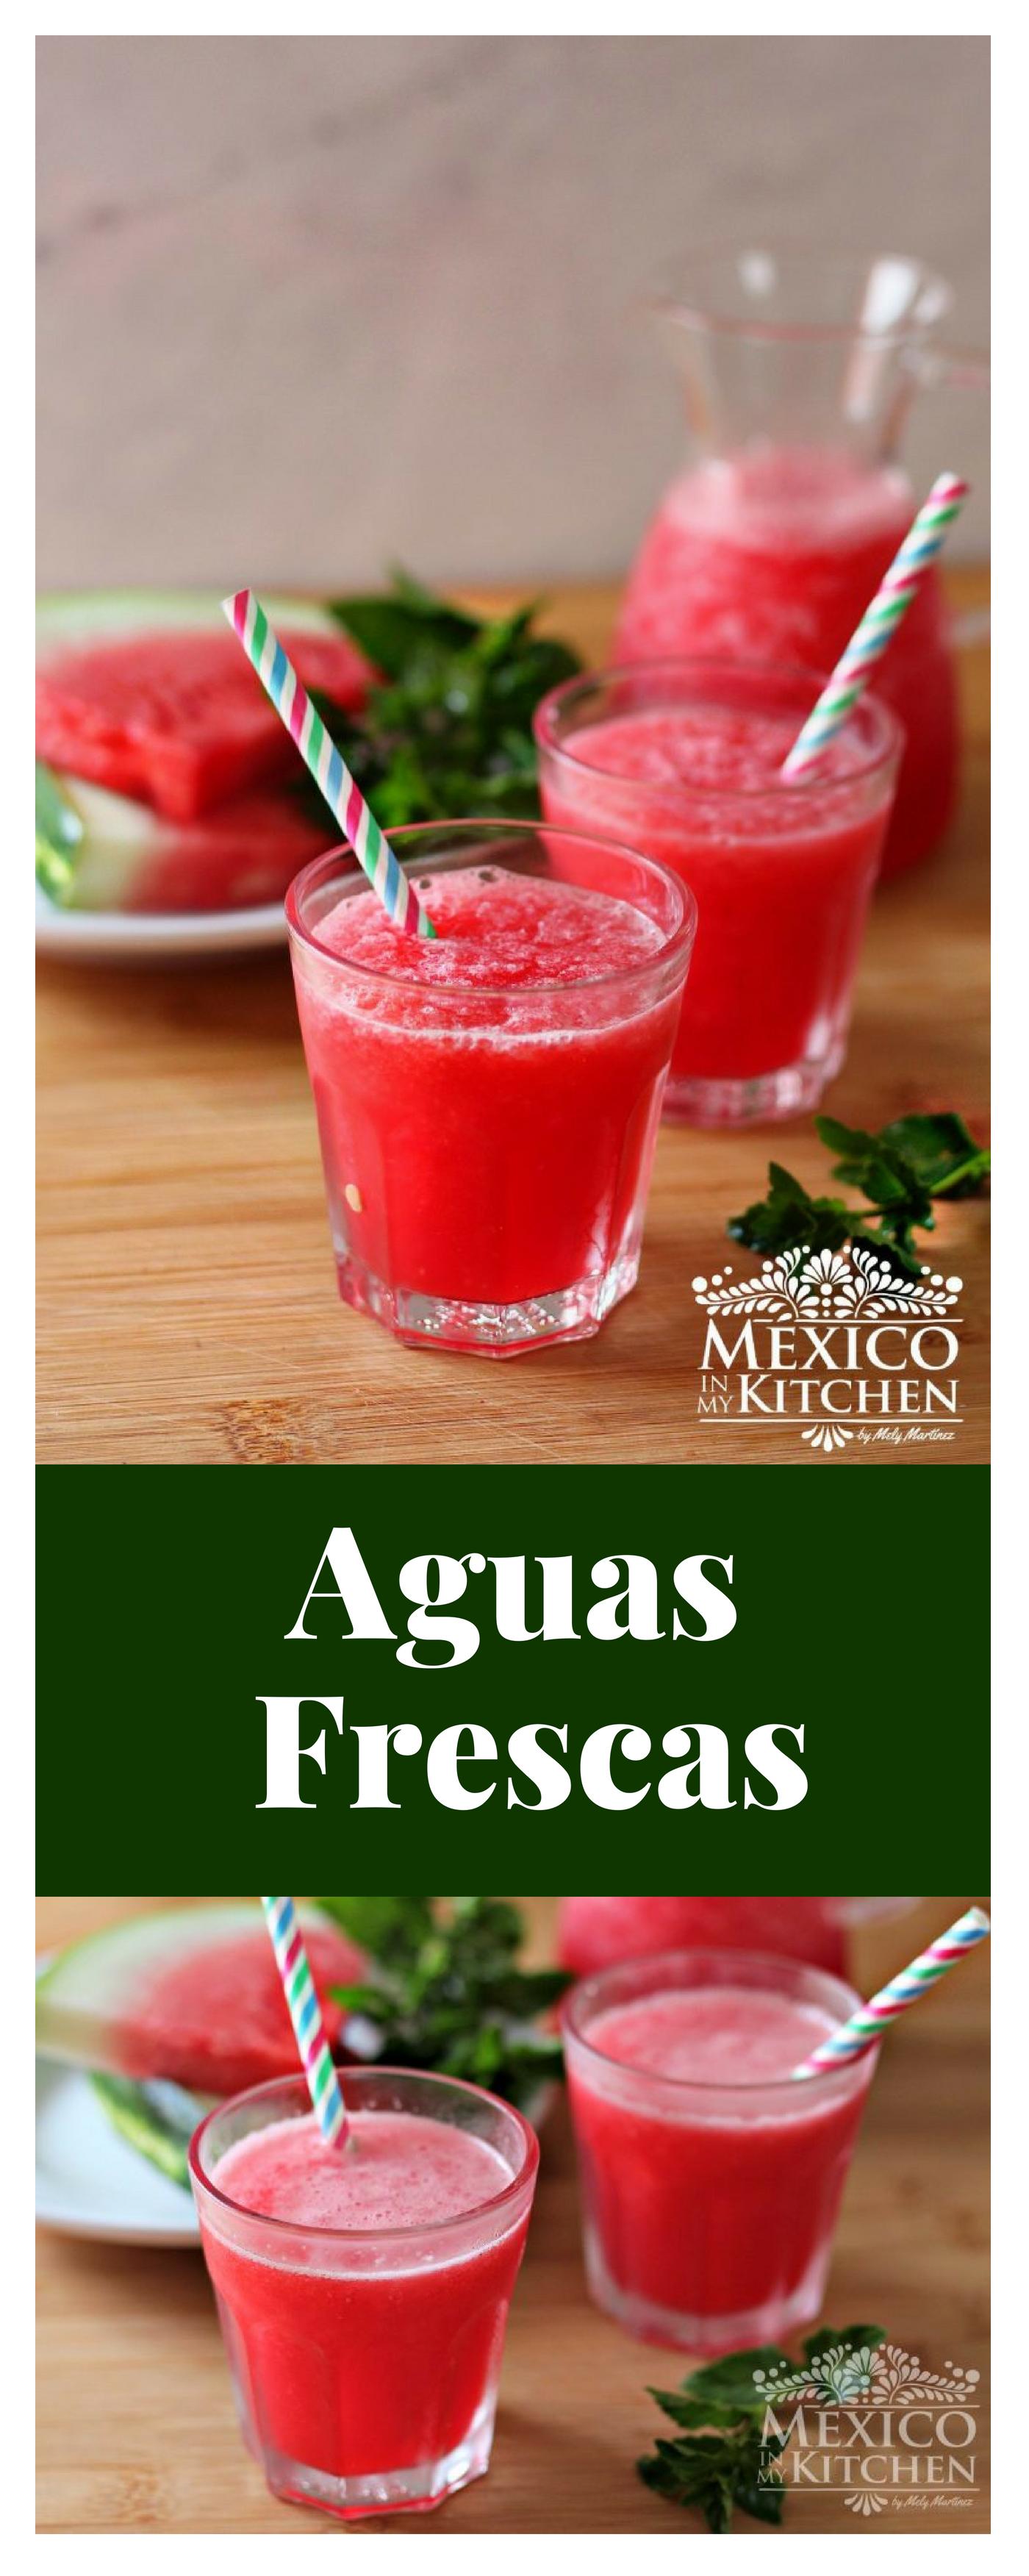 Aguas Frescas Pineapple Watermelon And Cantaloupe Drinks Enjoy Recipe Agua Fresca Fruit Drinks Mexican Food Recipes